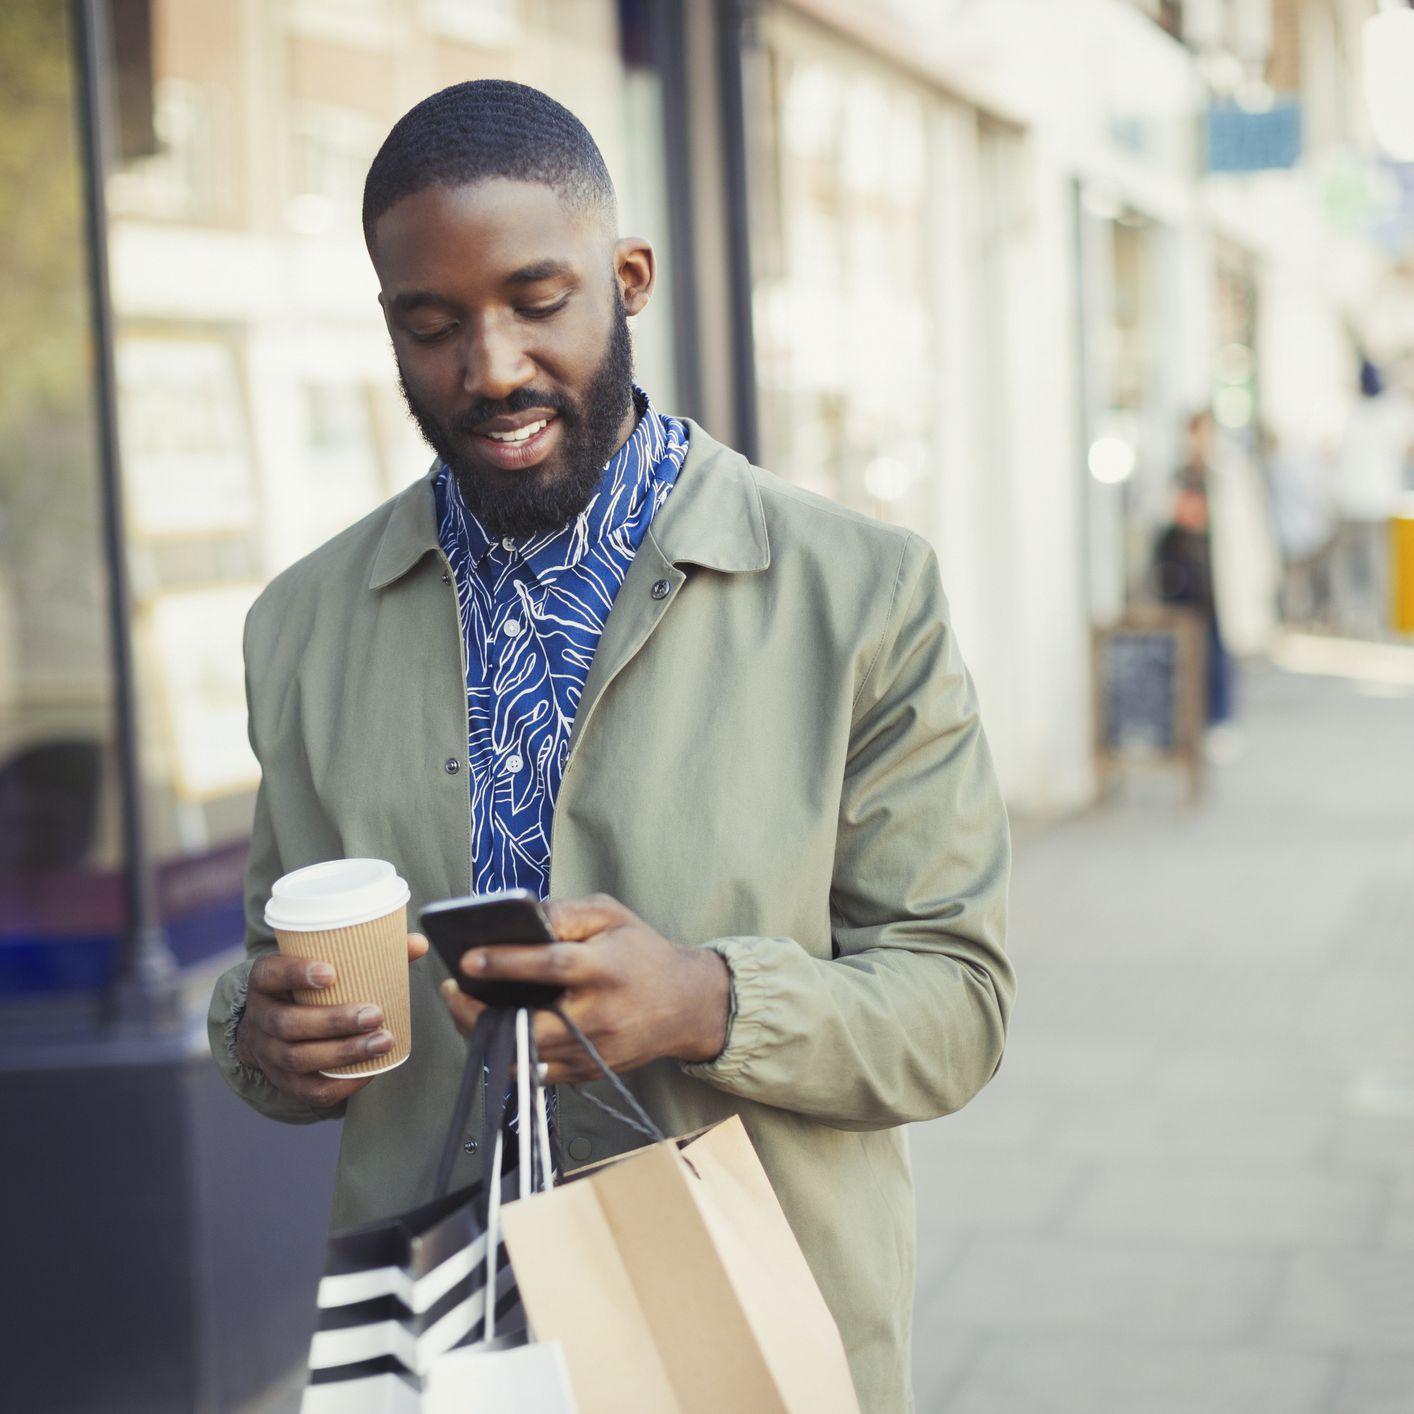 The 5 Best Straight Talk Phones at Walmart in 2019